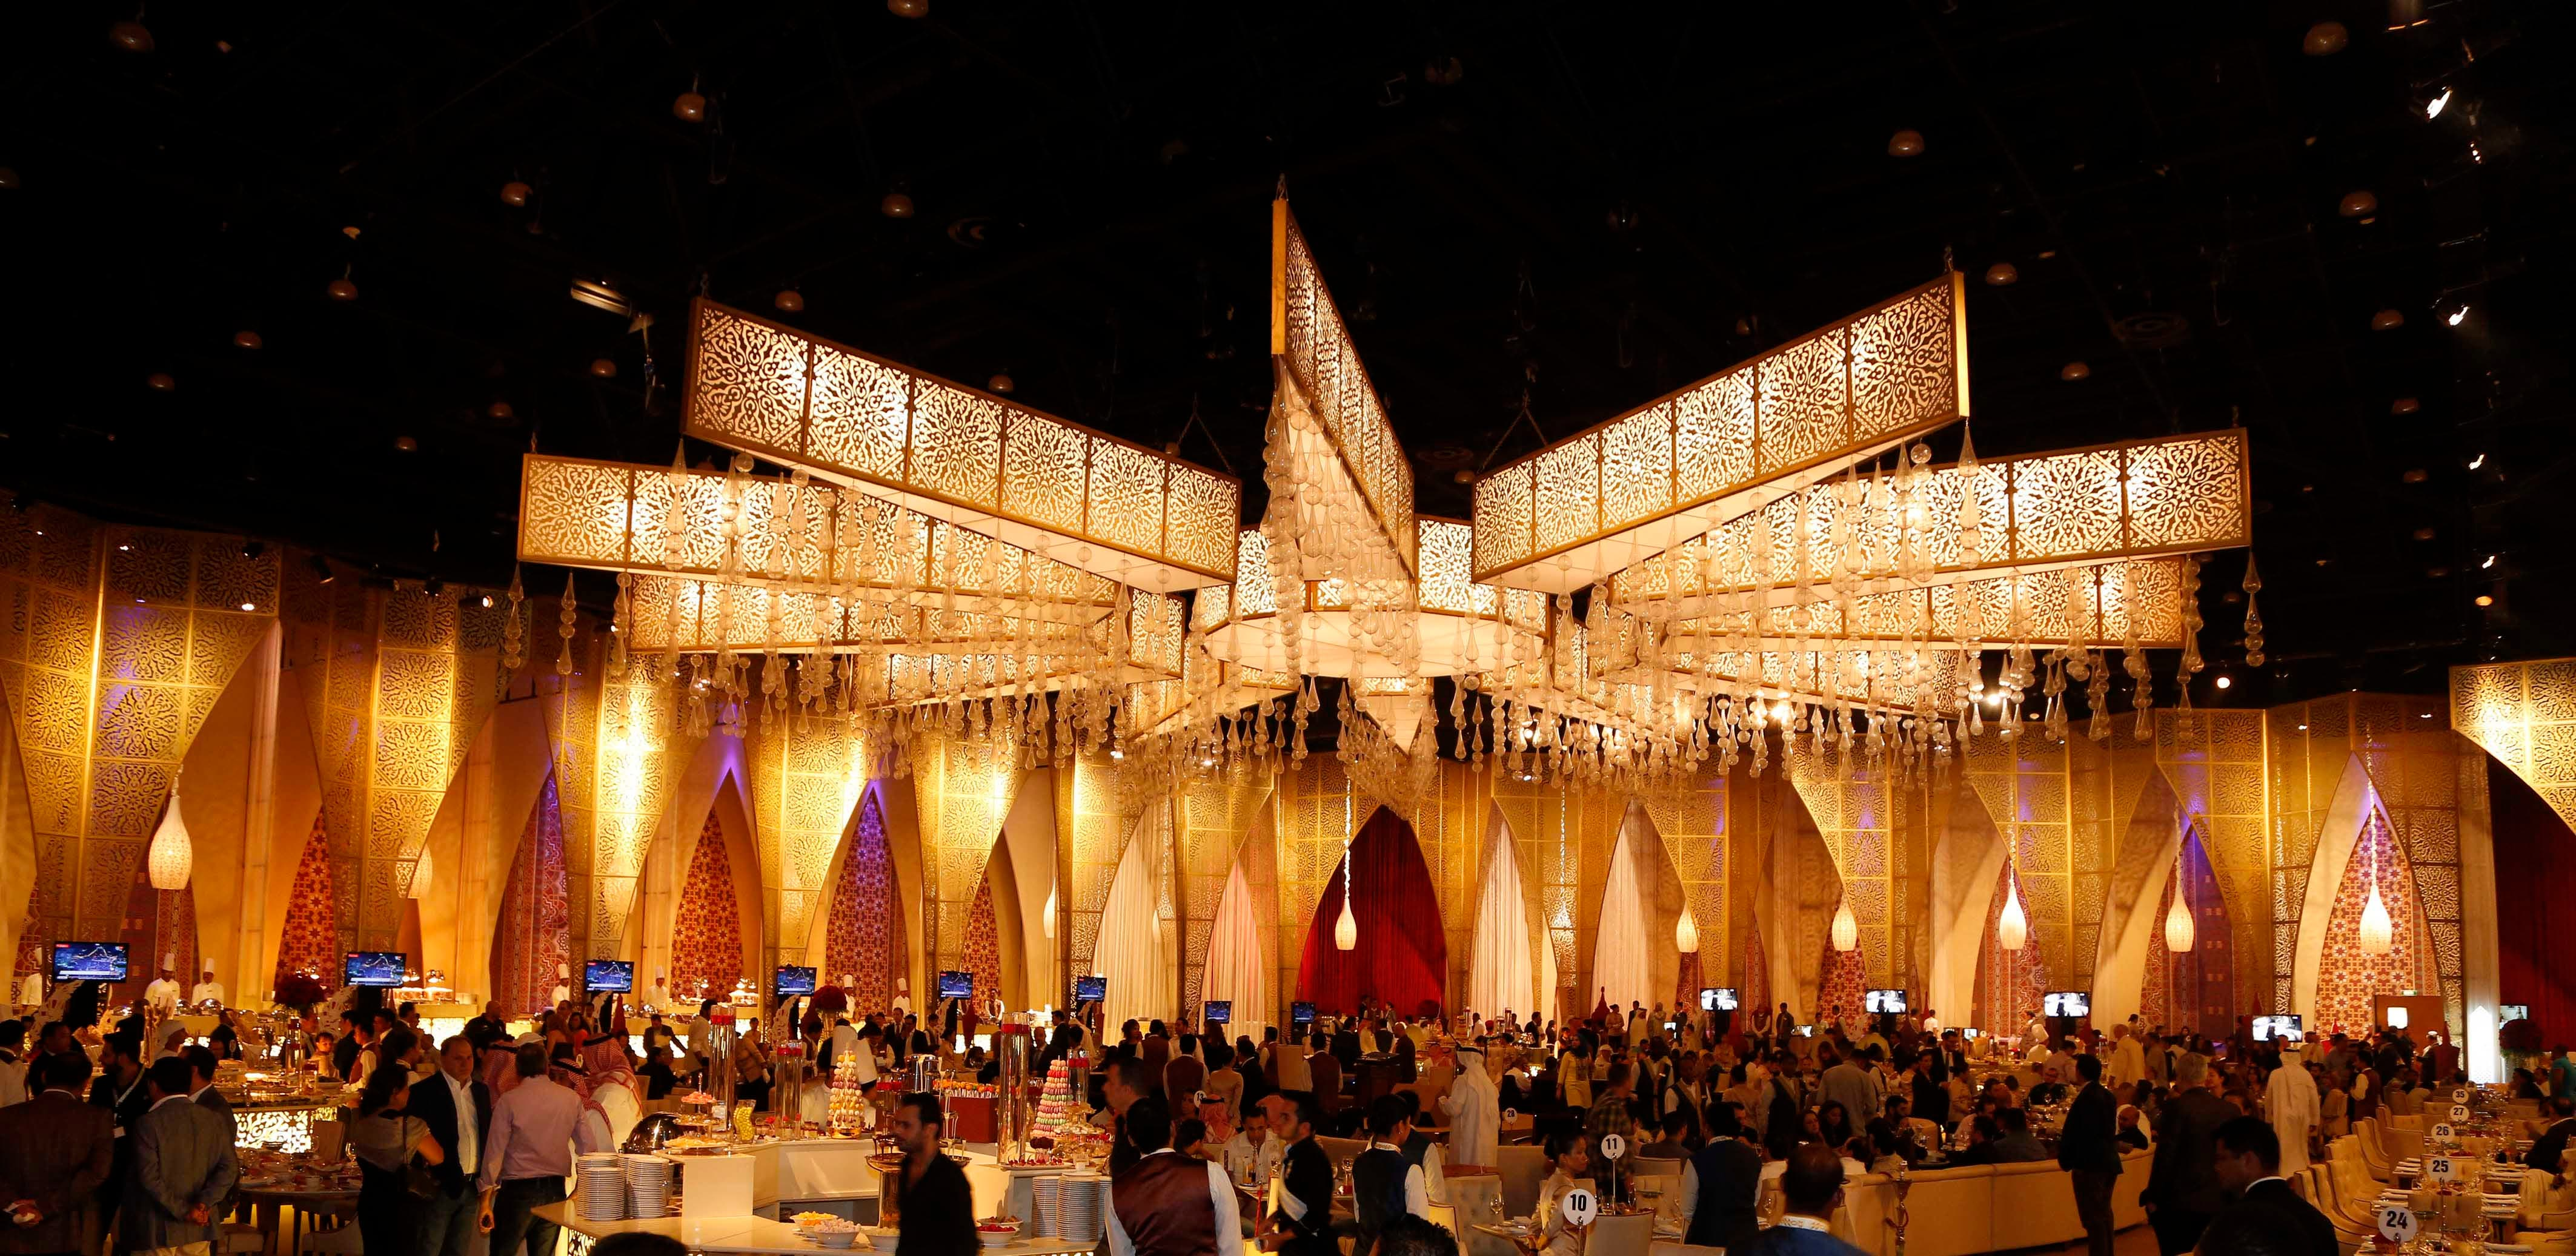 MBC Group Suhour 2013 Venue at Al Majlis Mina A Salam Dubai